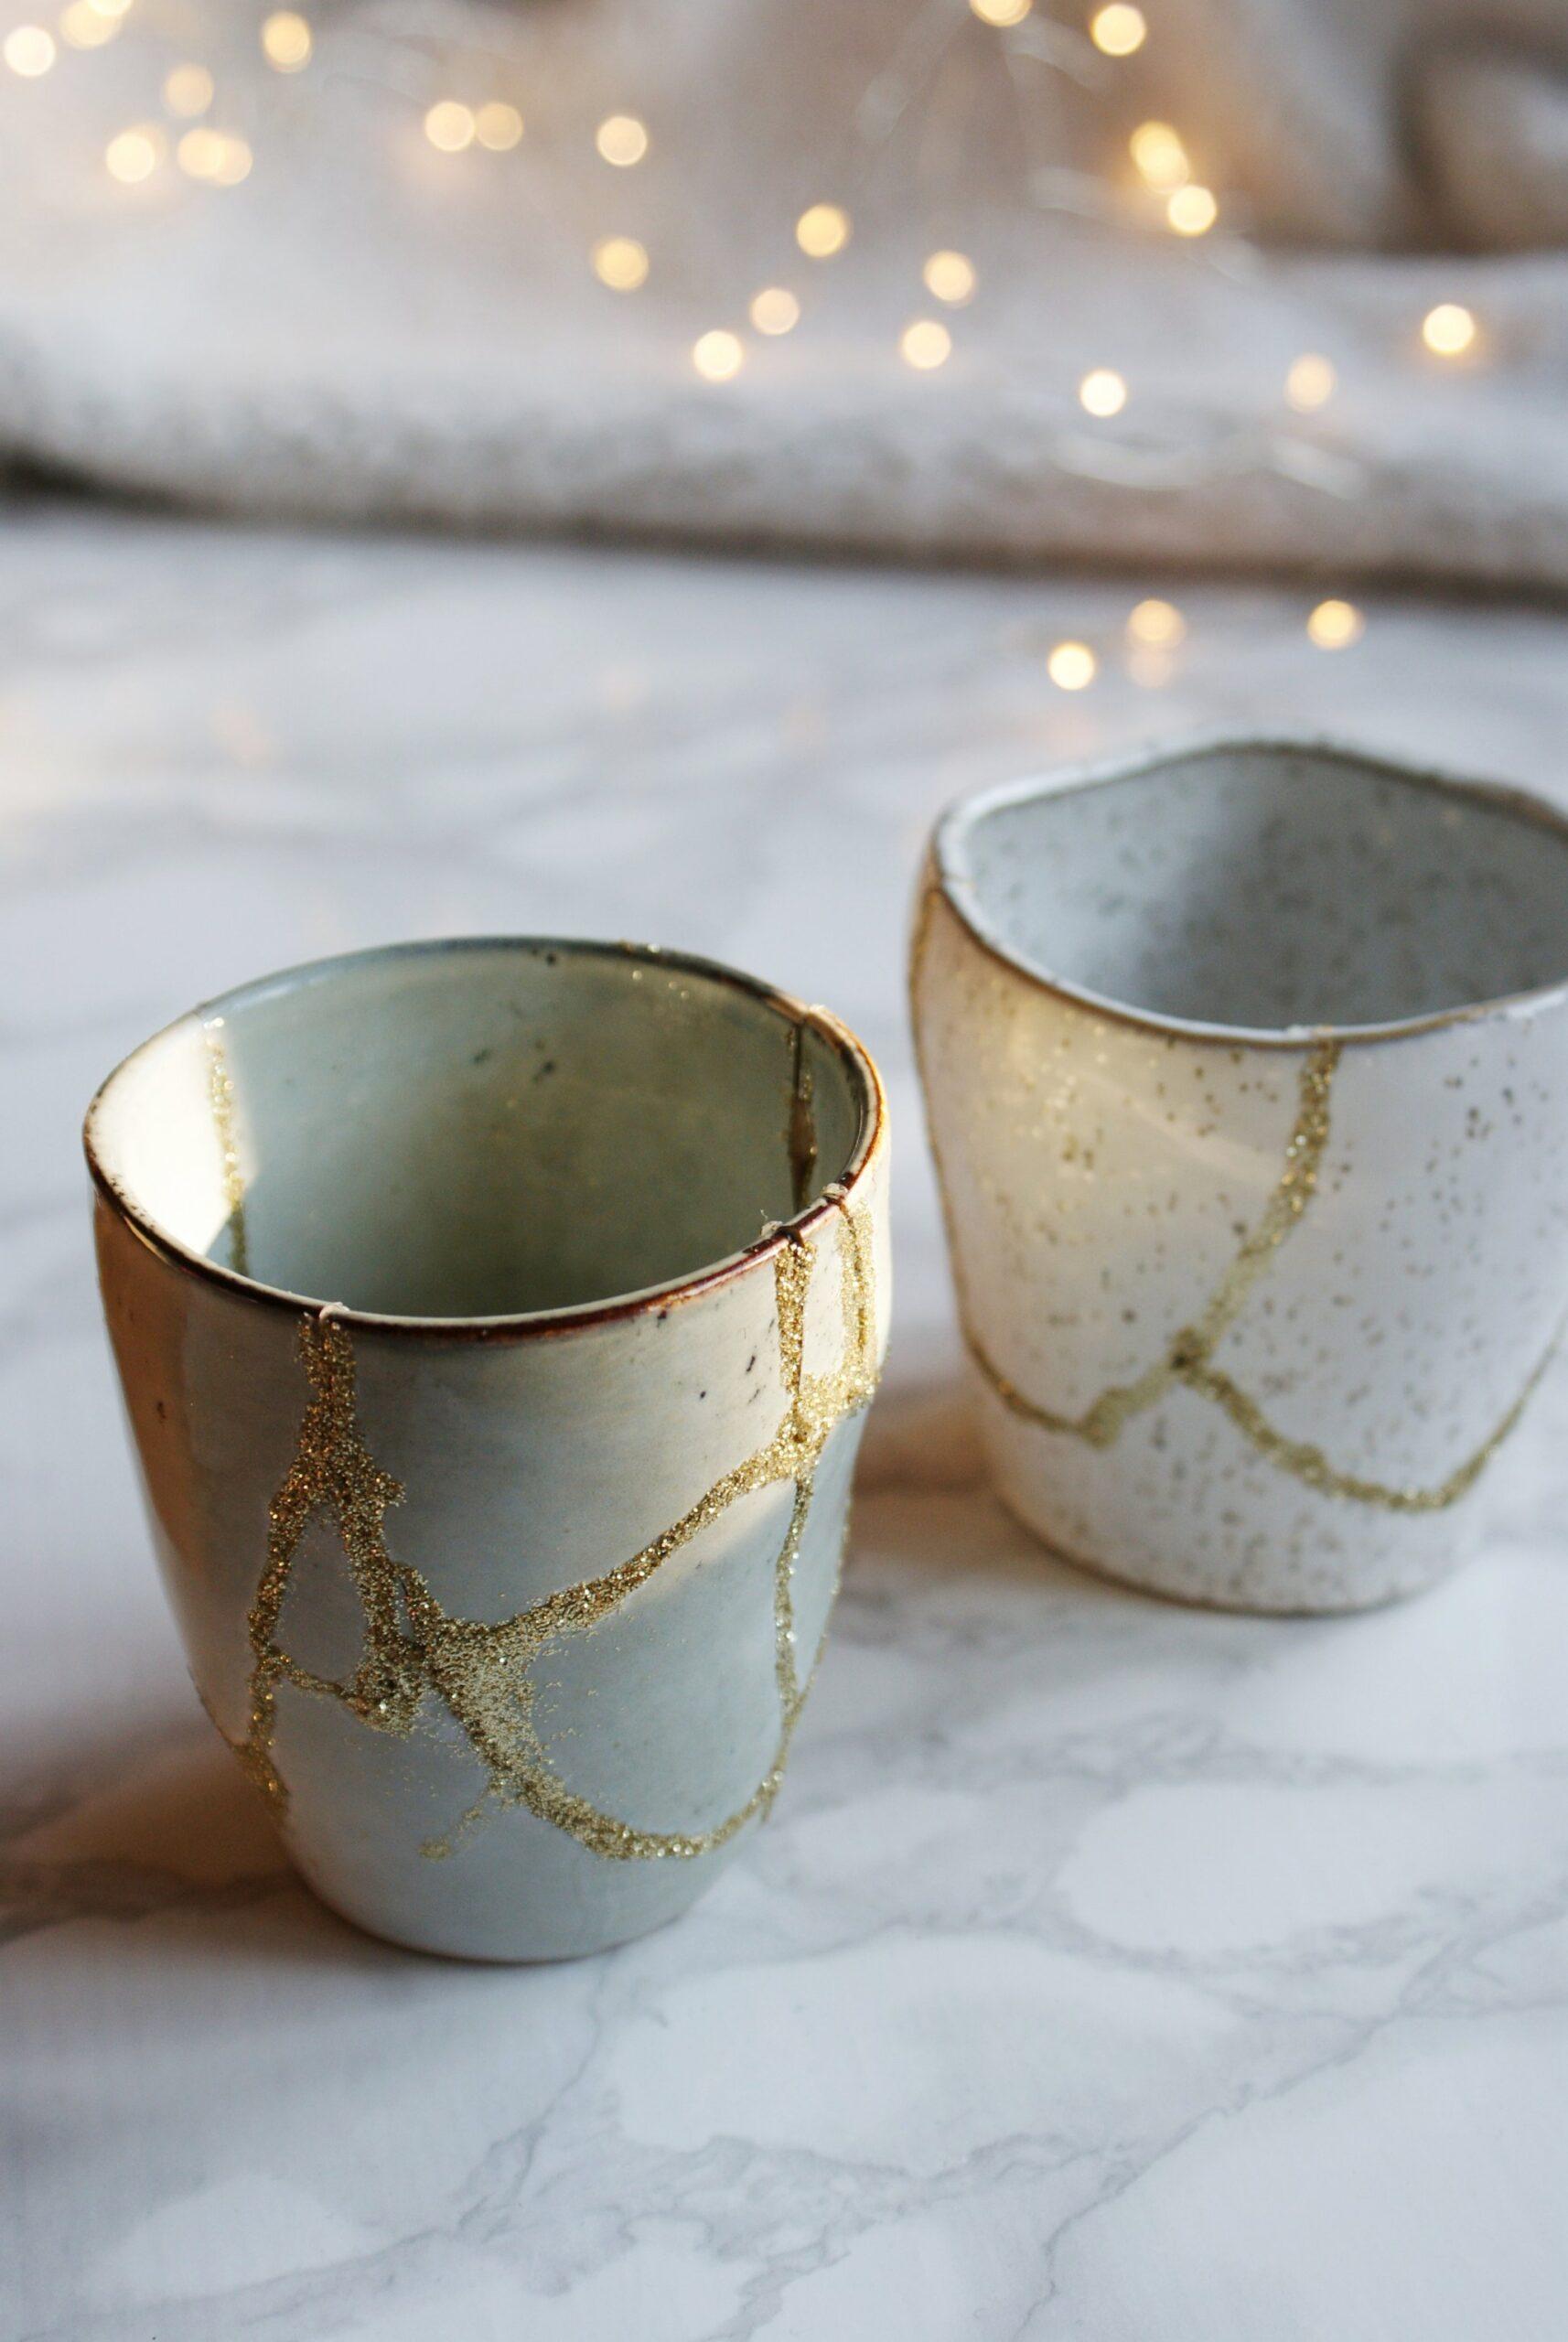 kintsugi giapponese faidate oro ceramica